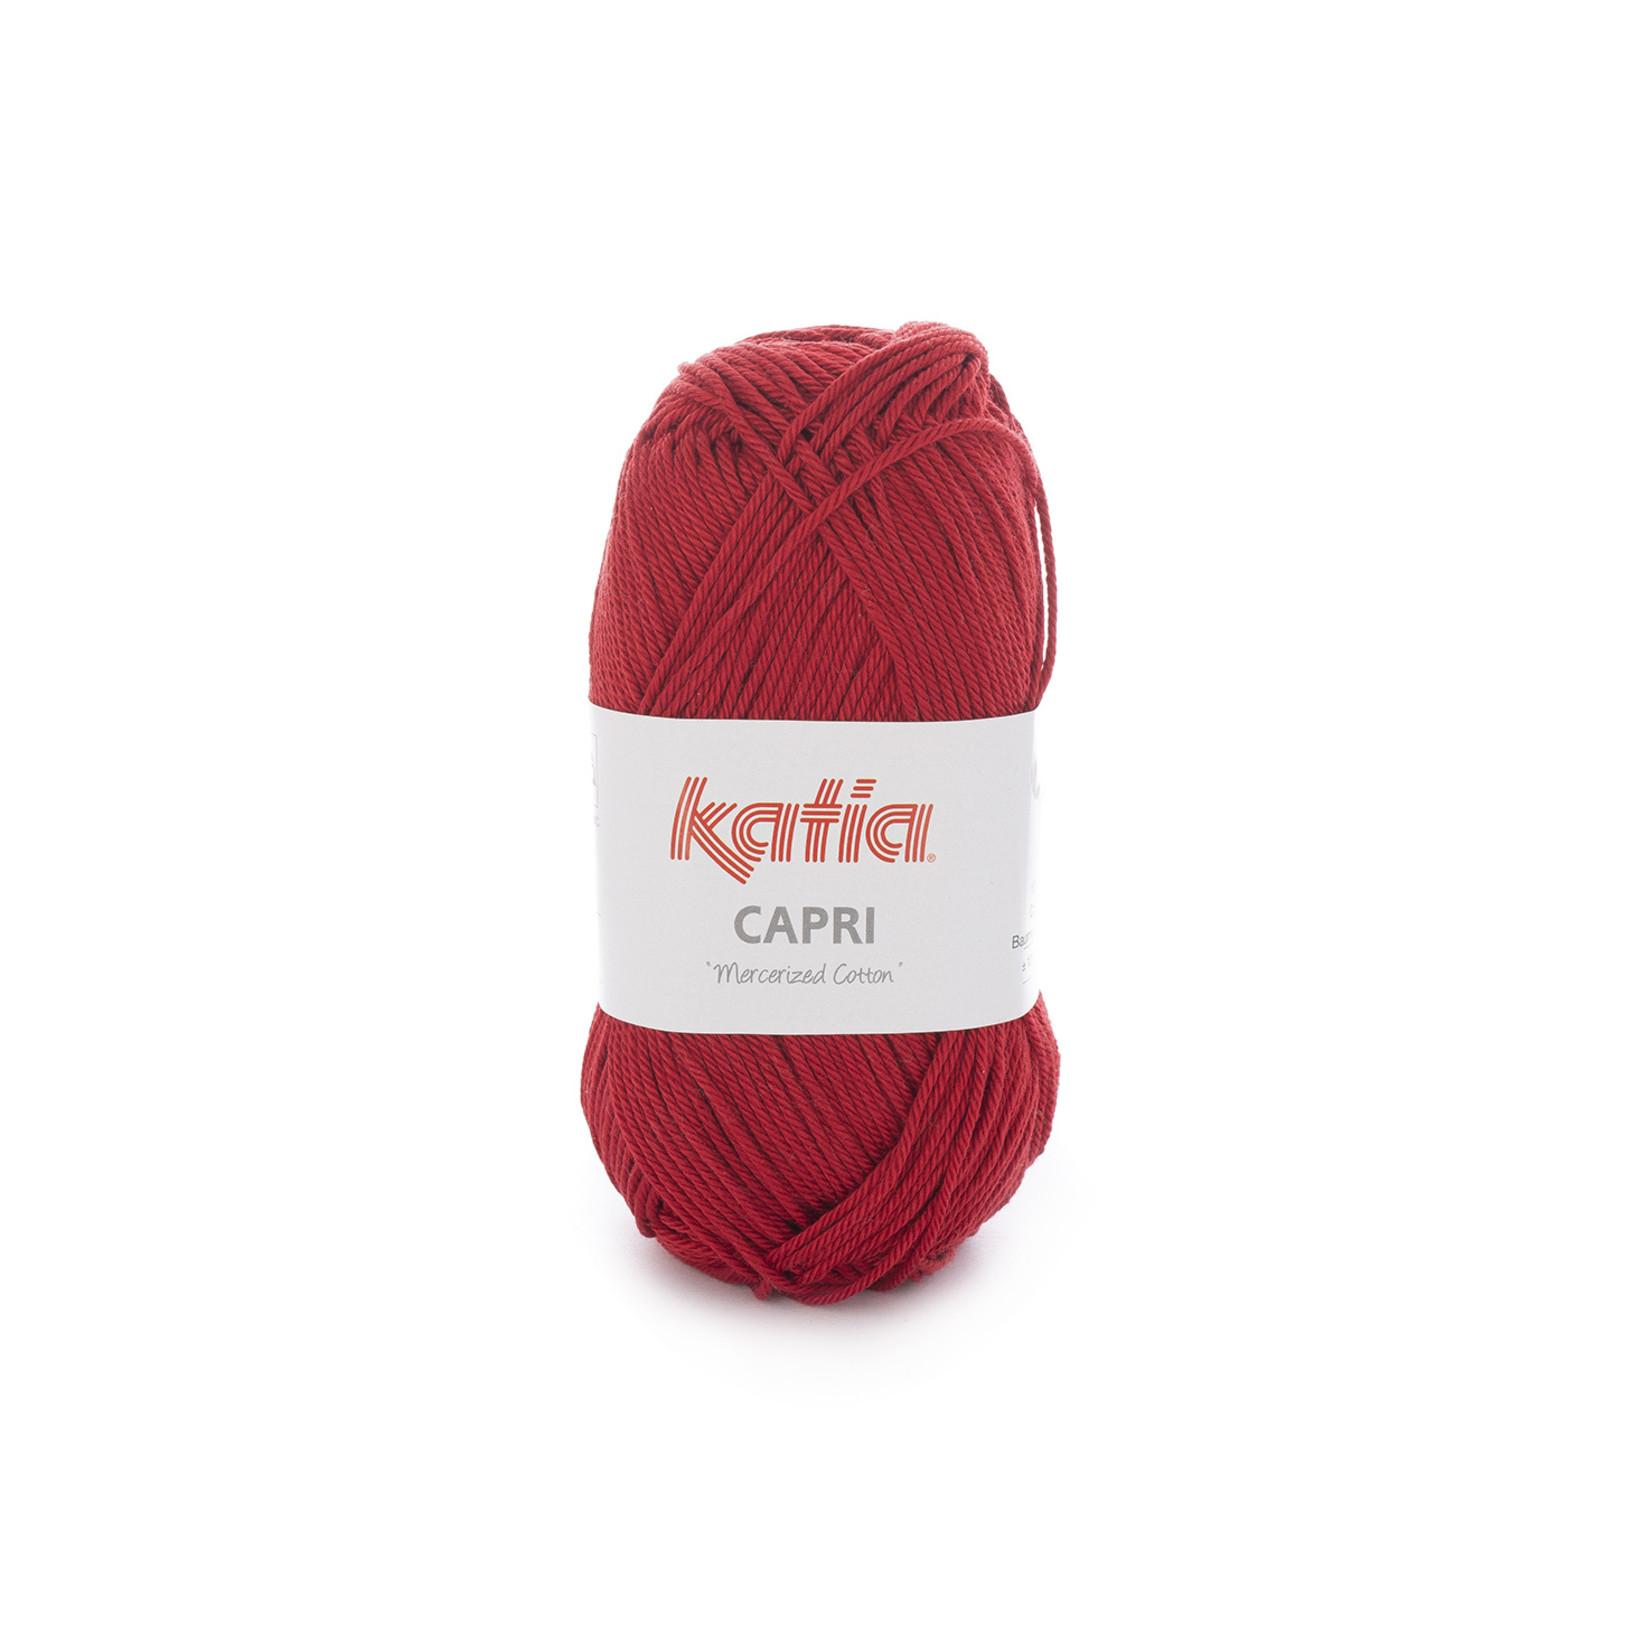 Katia Katia Capri - kleur 150 Wijnrood - 50 gr. = 125 m. - 100% katoen